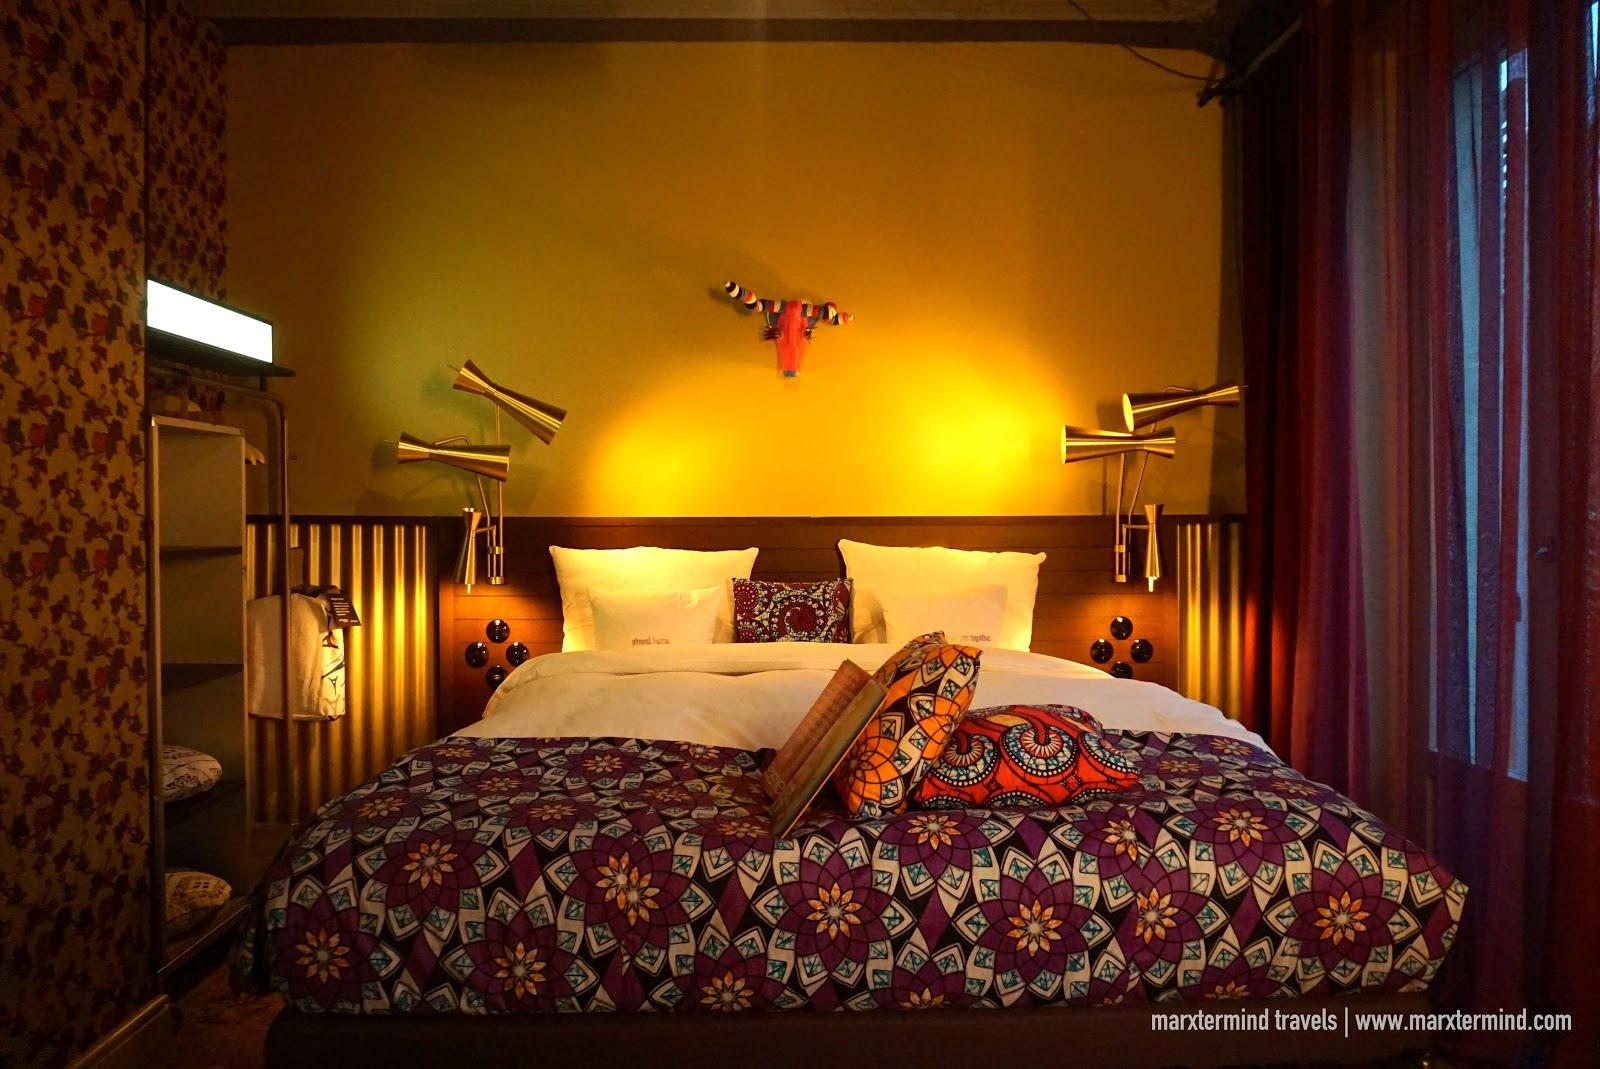 Large Plus Room at 25hours Hotel Paris